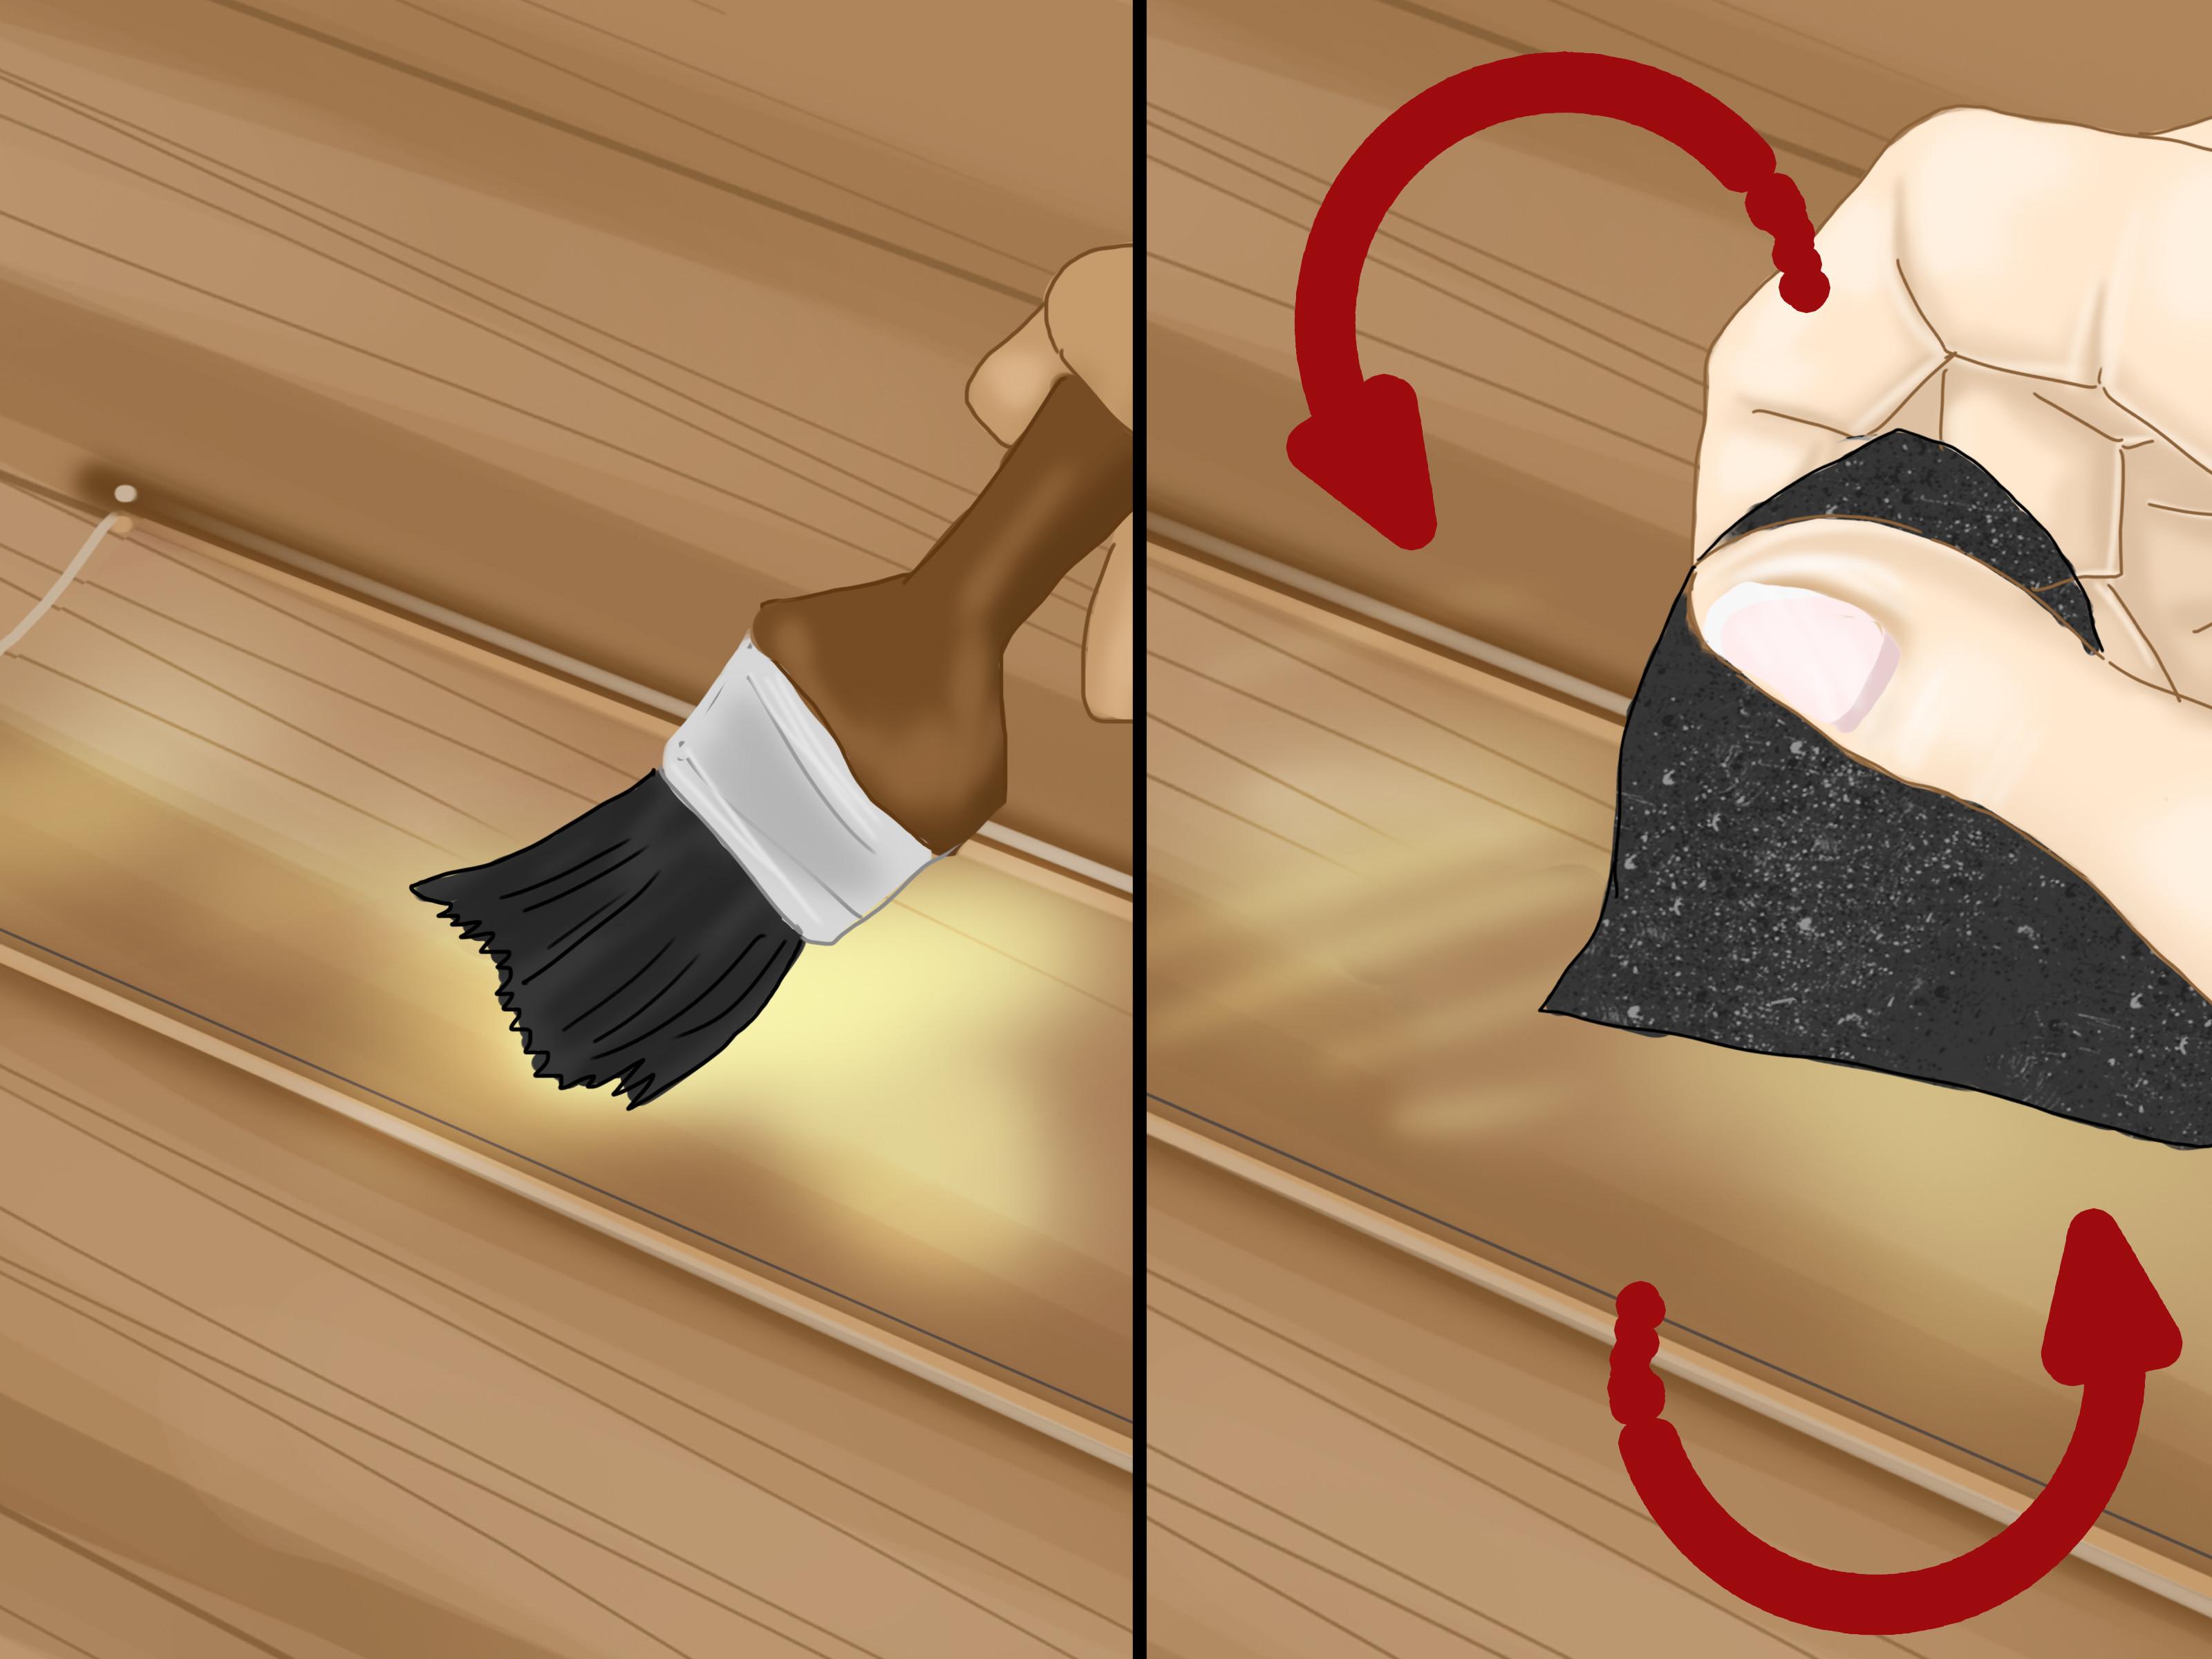 Kobalt Hardwood Floor Nailer Of 5 Easy Ways to Get Permanent Marker Stain Out Of Hardwood Flooring In Get Permanent Marker Stain Out Of Hardwood Flooring Step 36